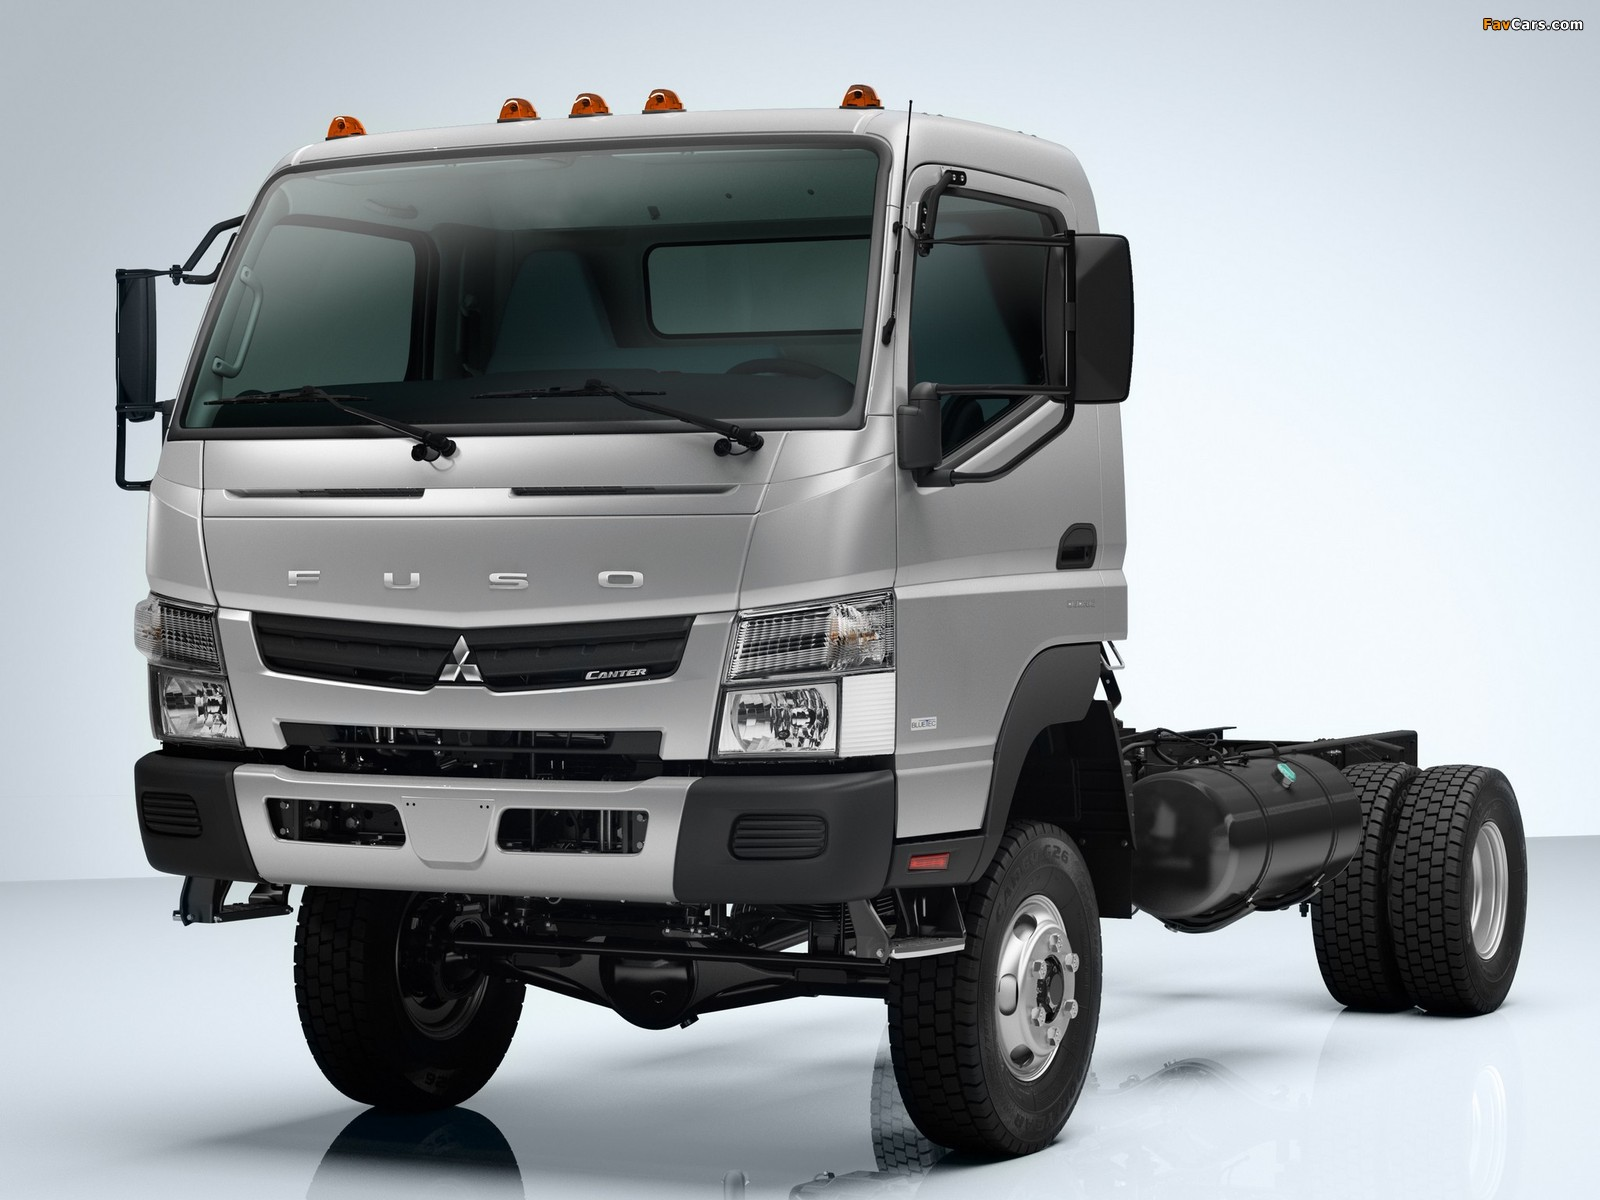 Mitsubishi Fuso Canter 6C18 US-spec (FG7) 2011 photos (1600 x 1200)